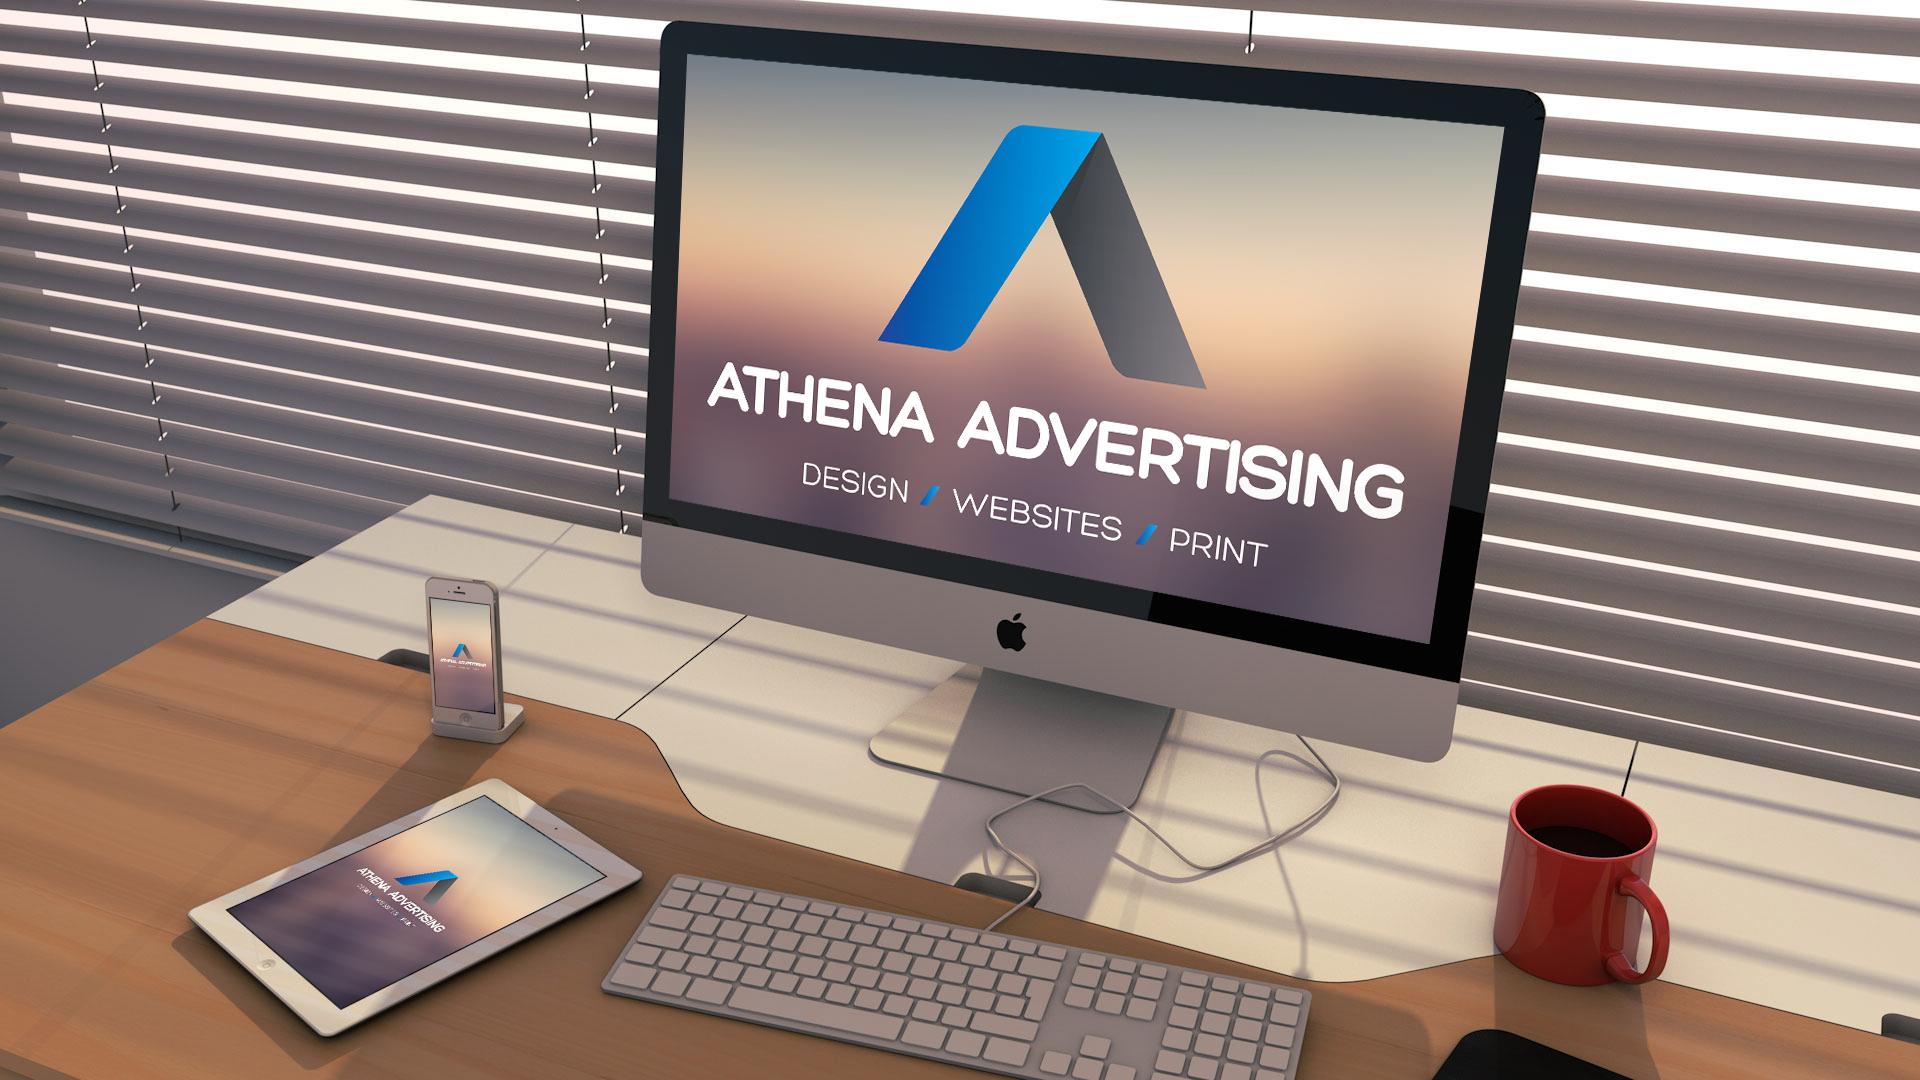 athena advertising website